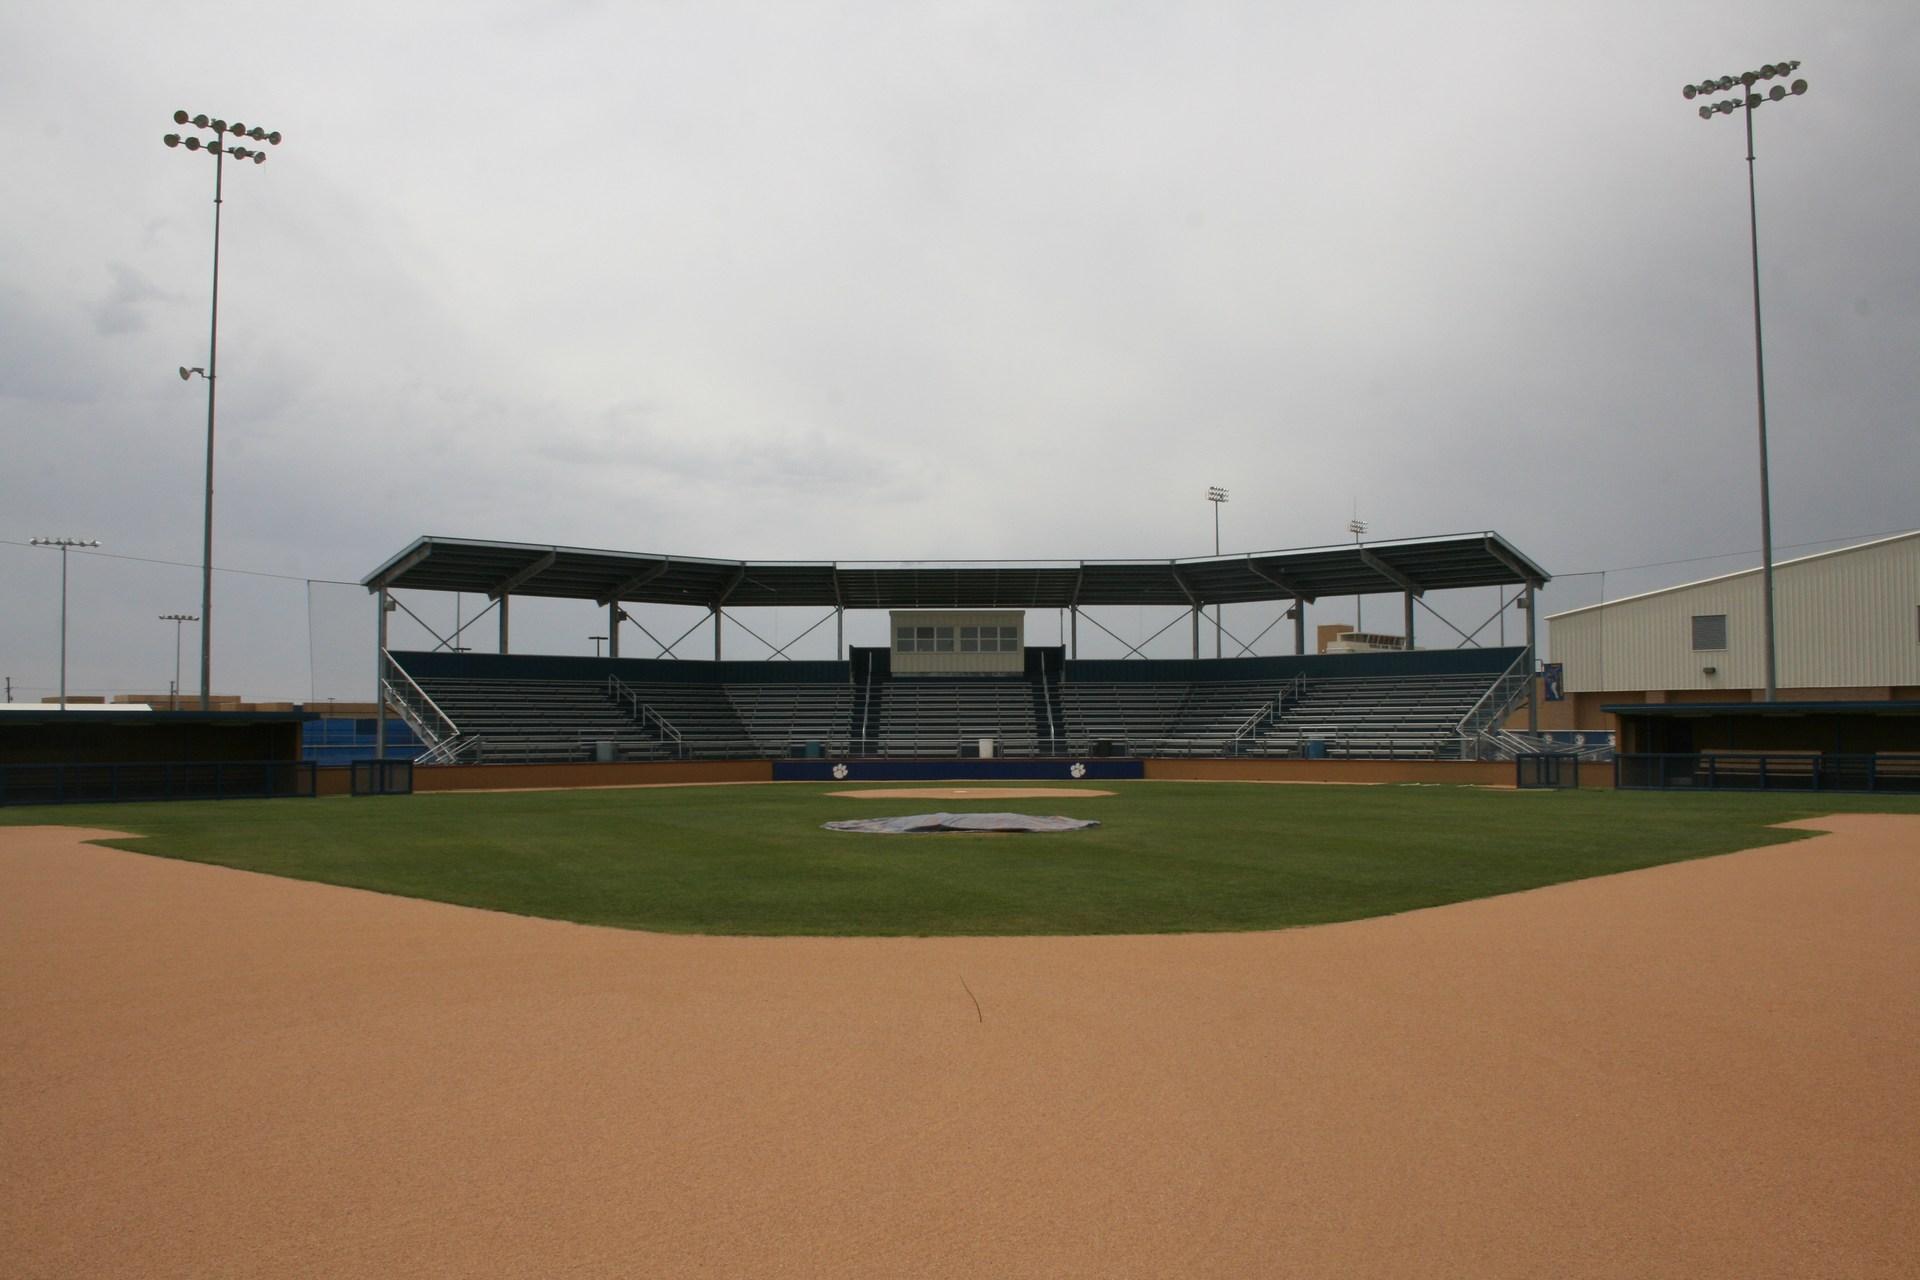 Tiger Baseball Stadium